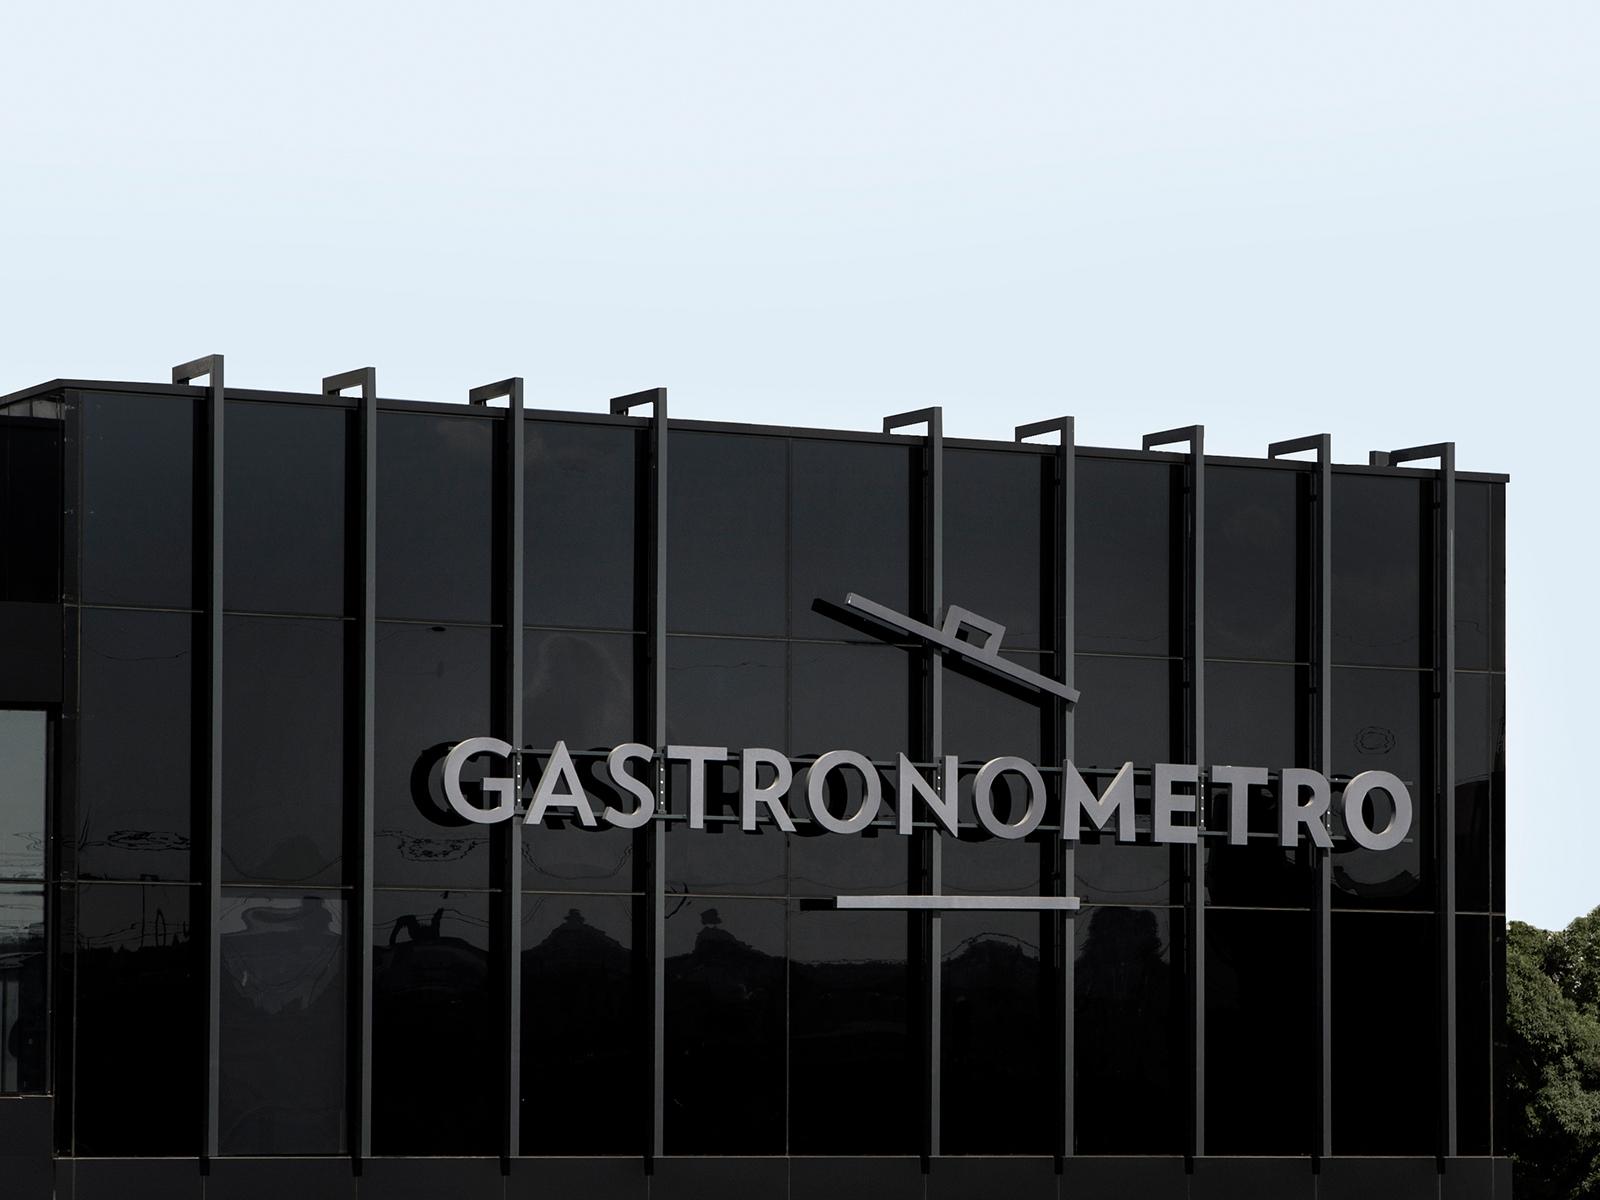 Gastronometro Branding typography line kitchen illustration icon gastronomy food design culinary chef branding logo